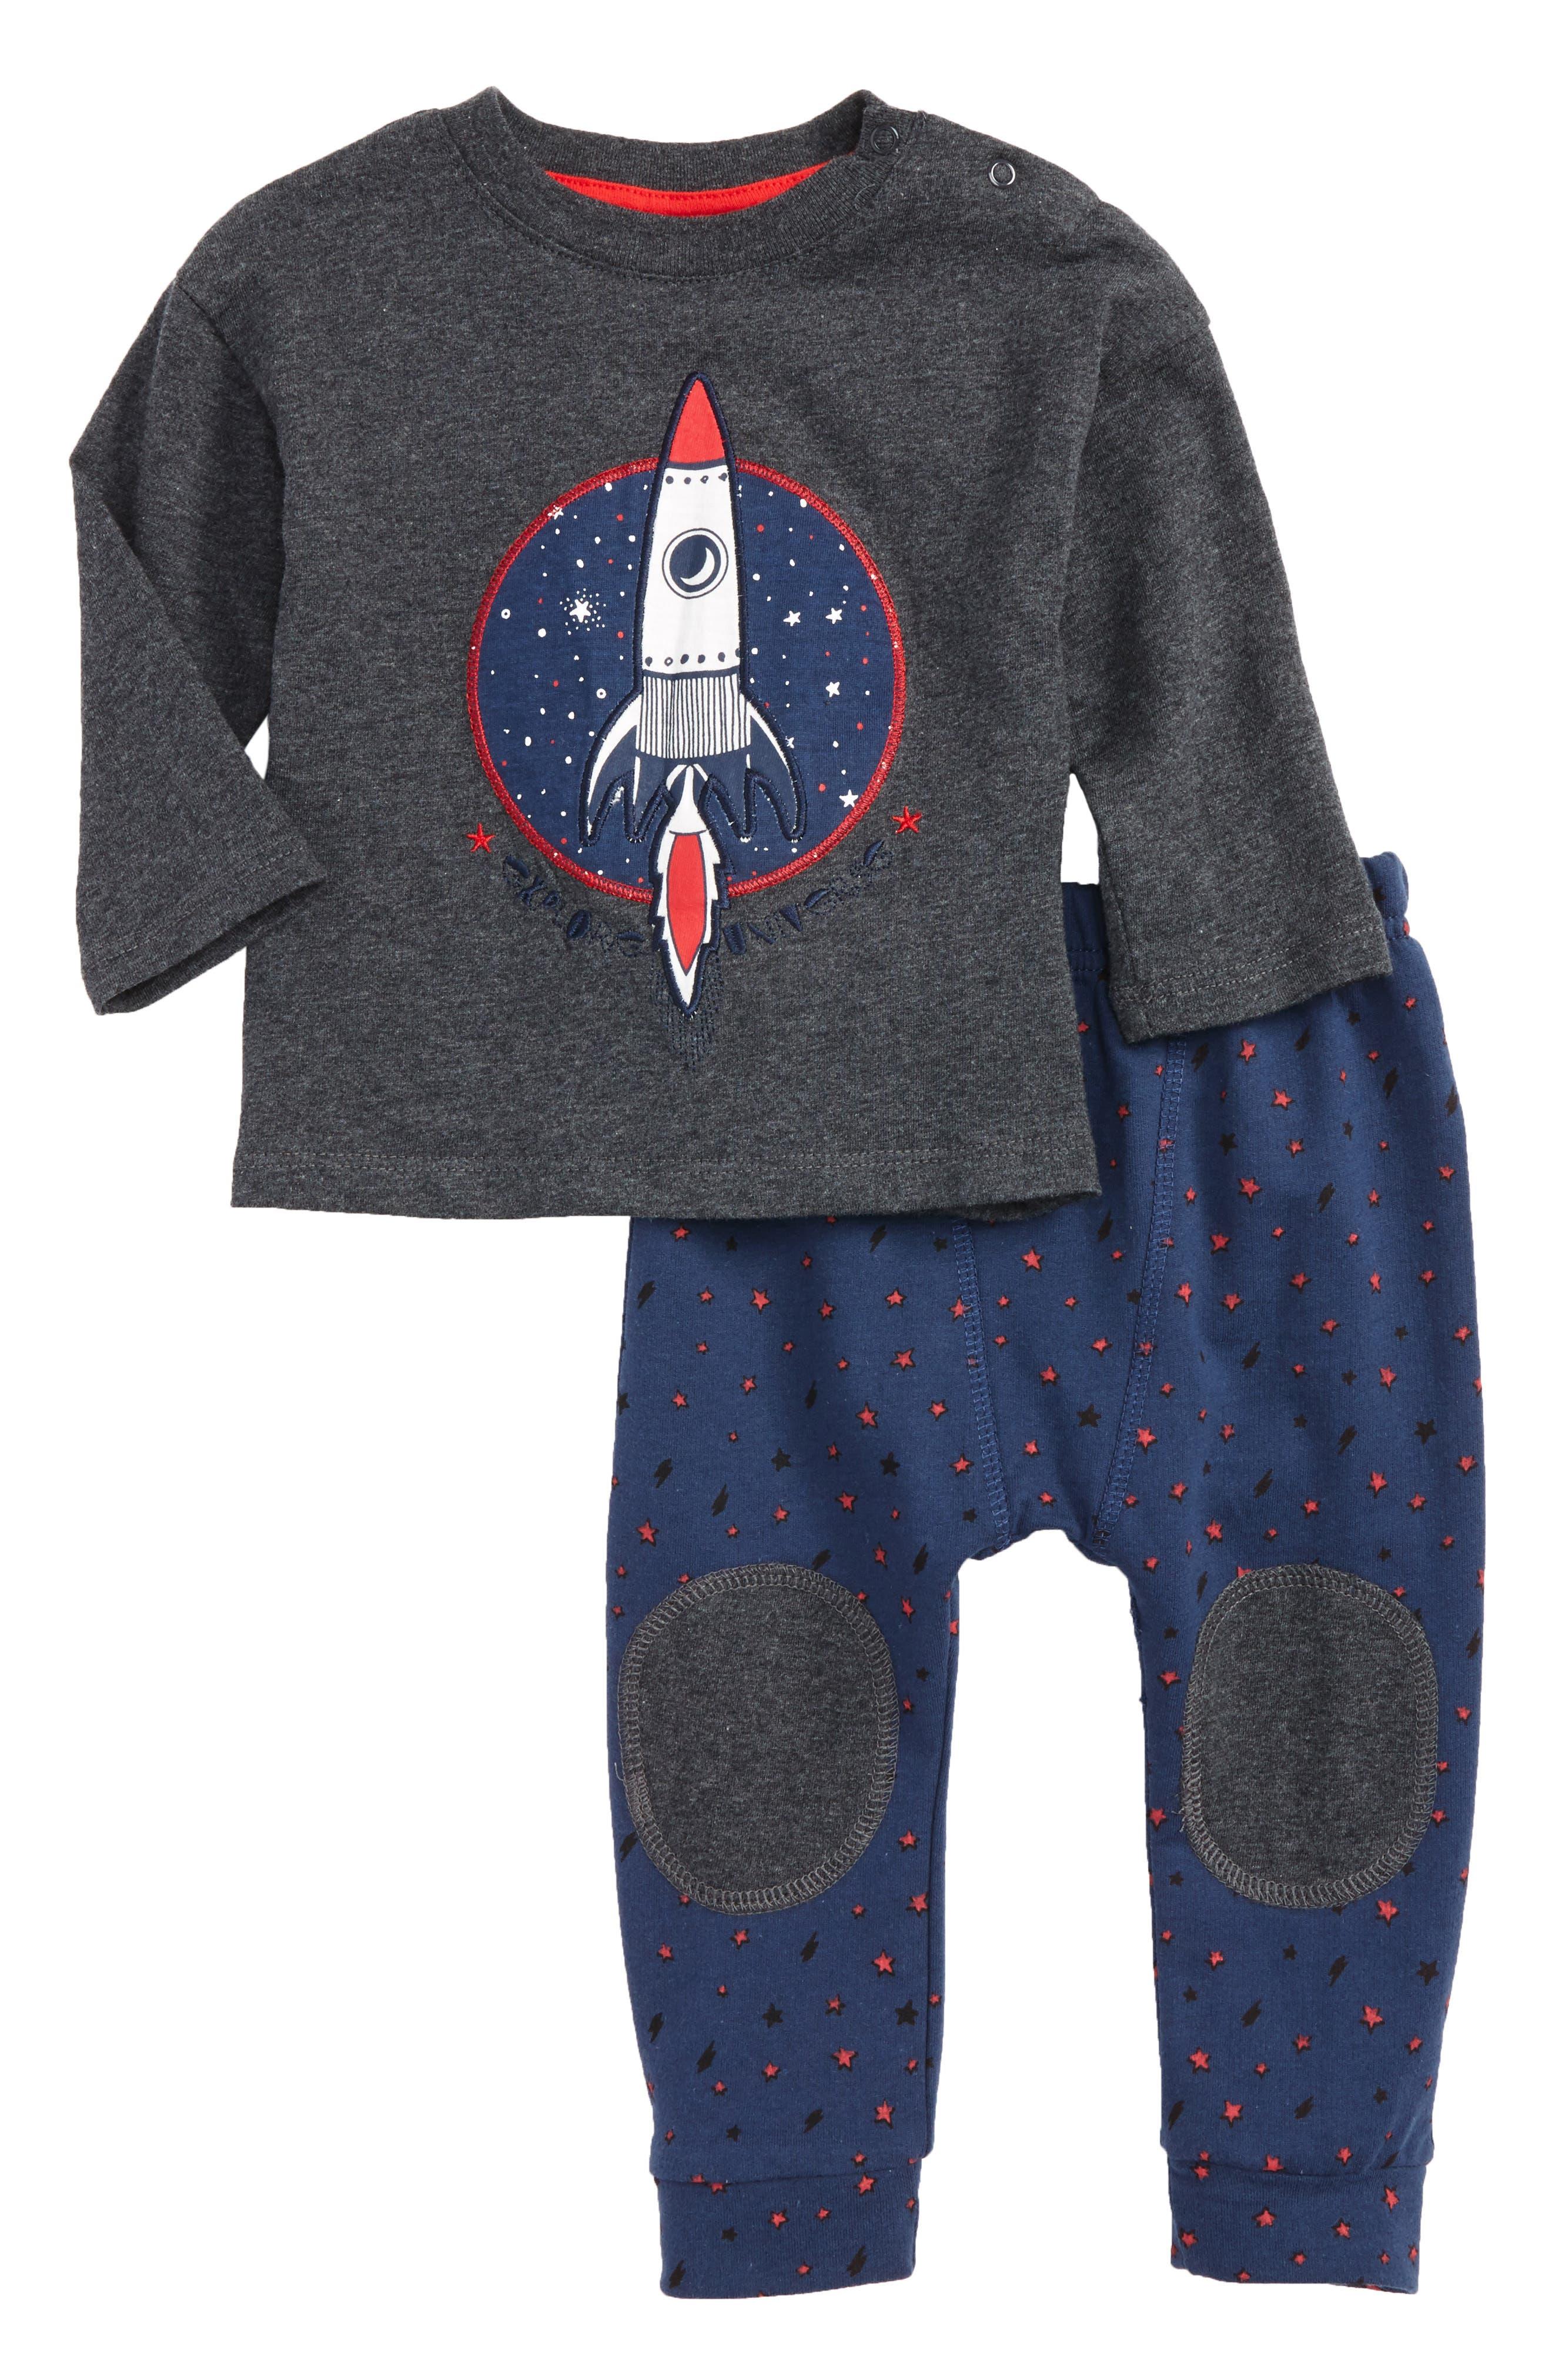 Rosie Pope Rocket Appliqué T-Shirt & Star Print Pants Set (Baby Boys)